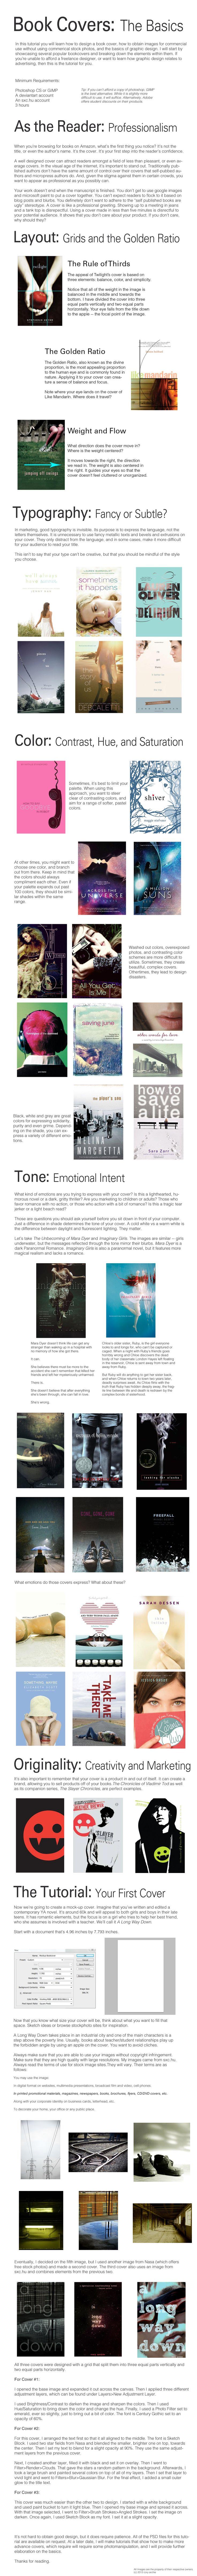 Book Cover Design Basics